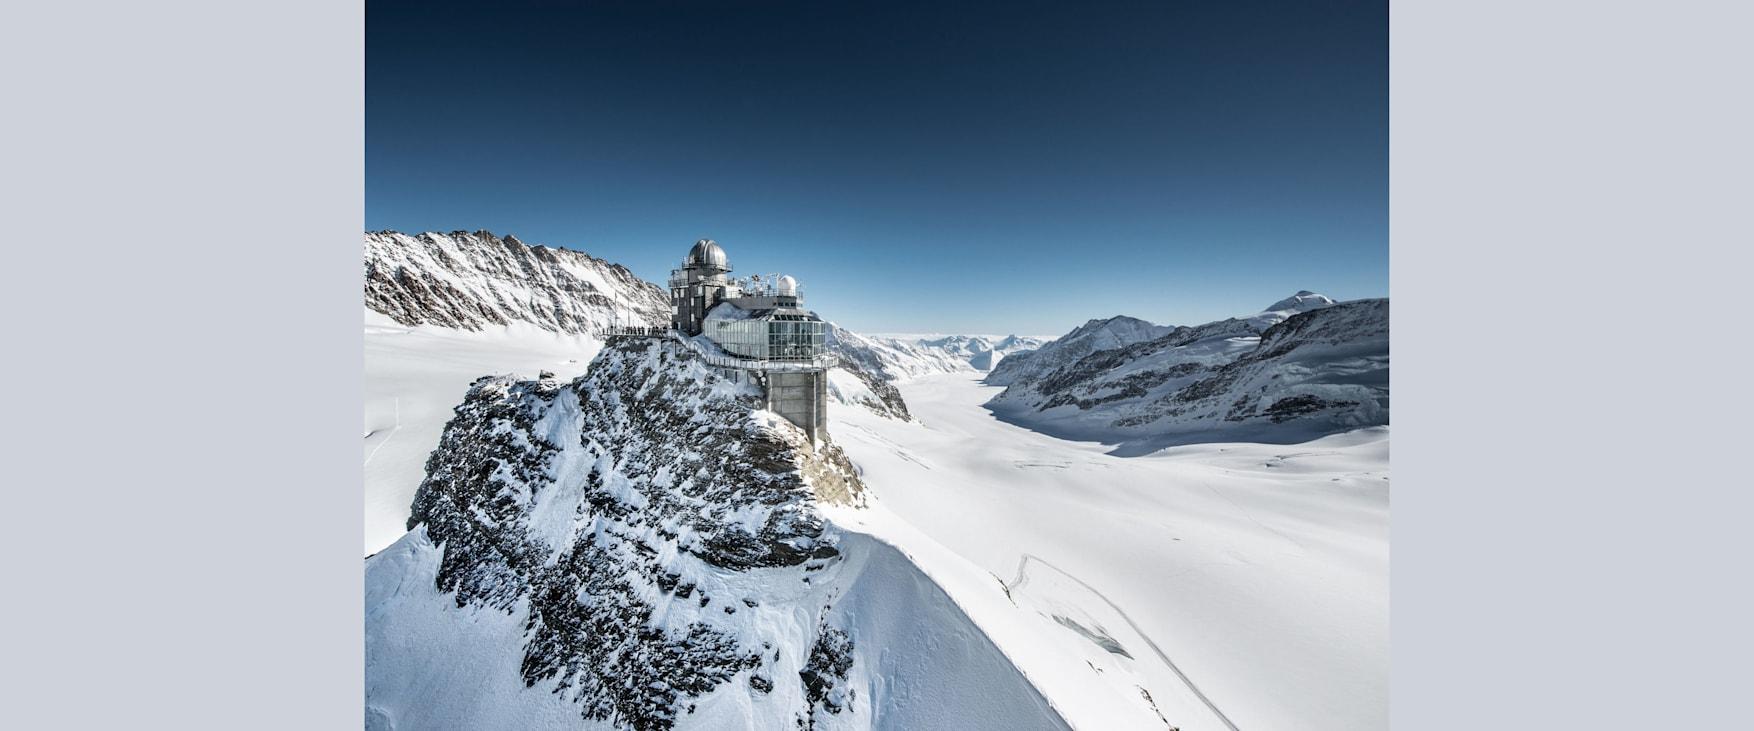 Sphinx aletschgletscher jungfraujoch top of europe